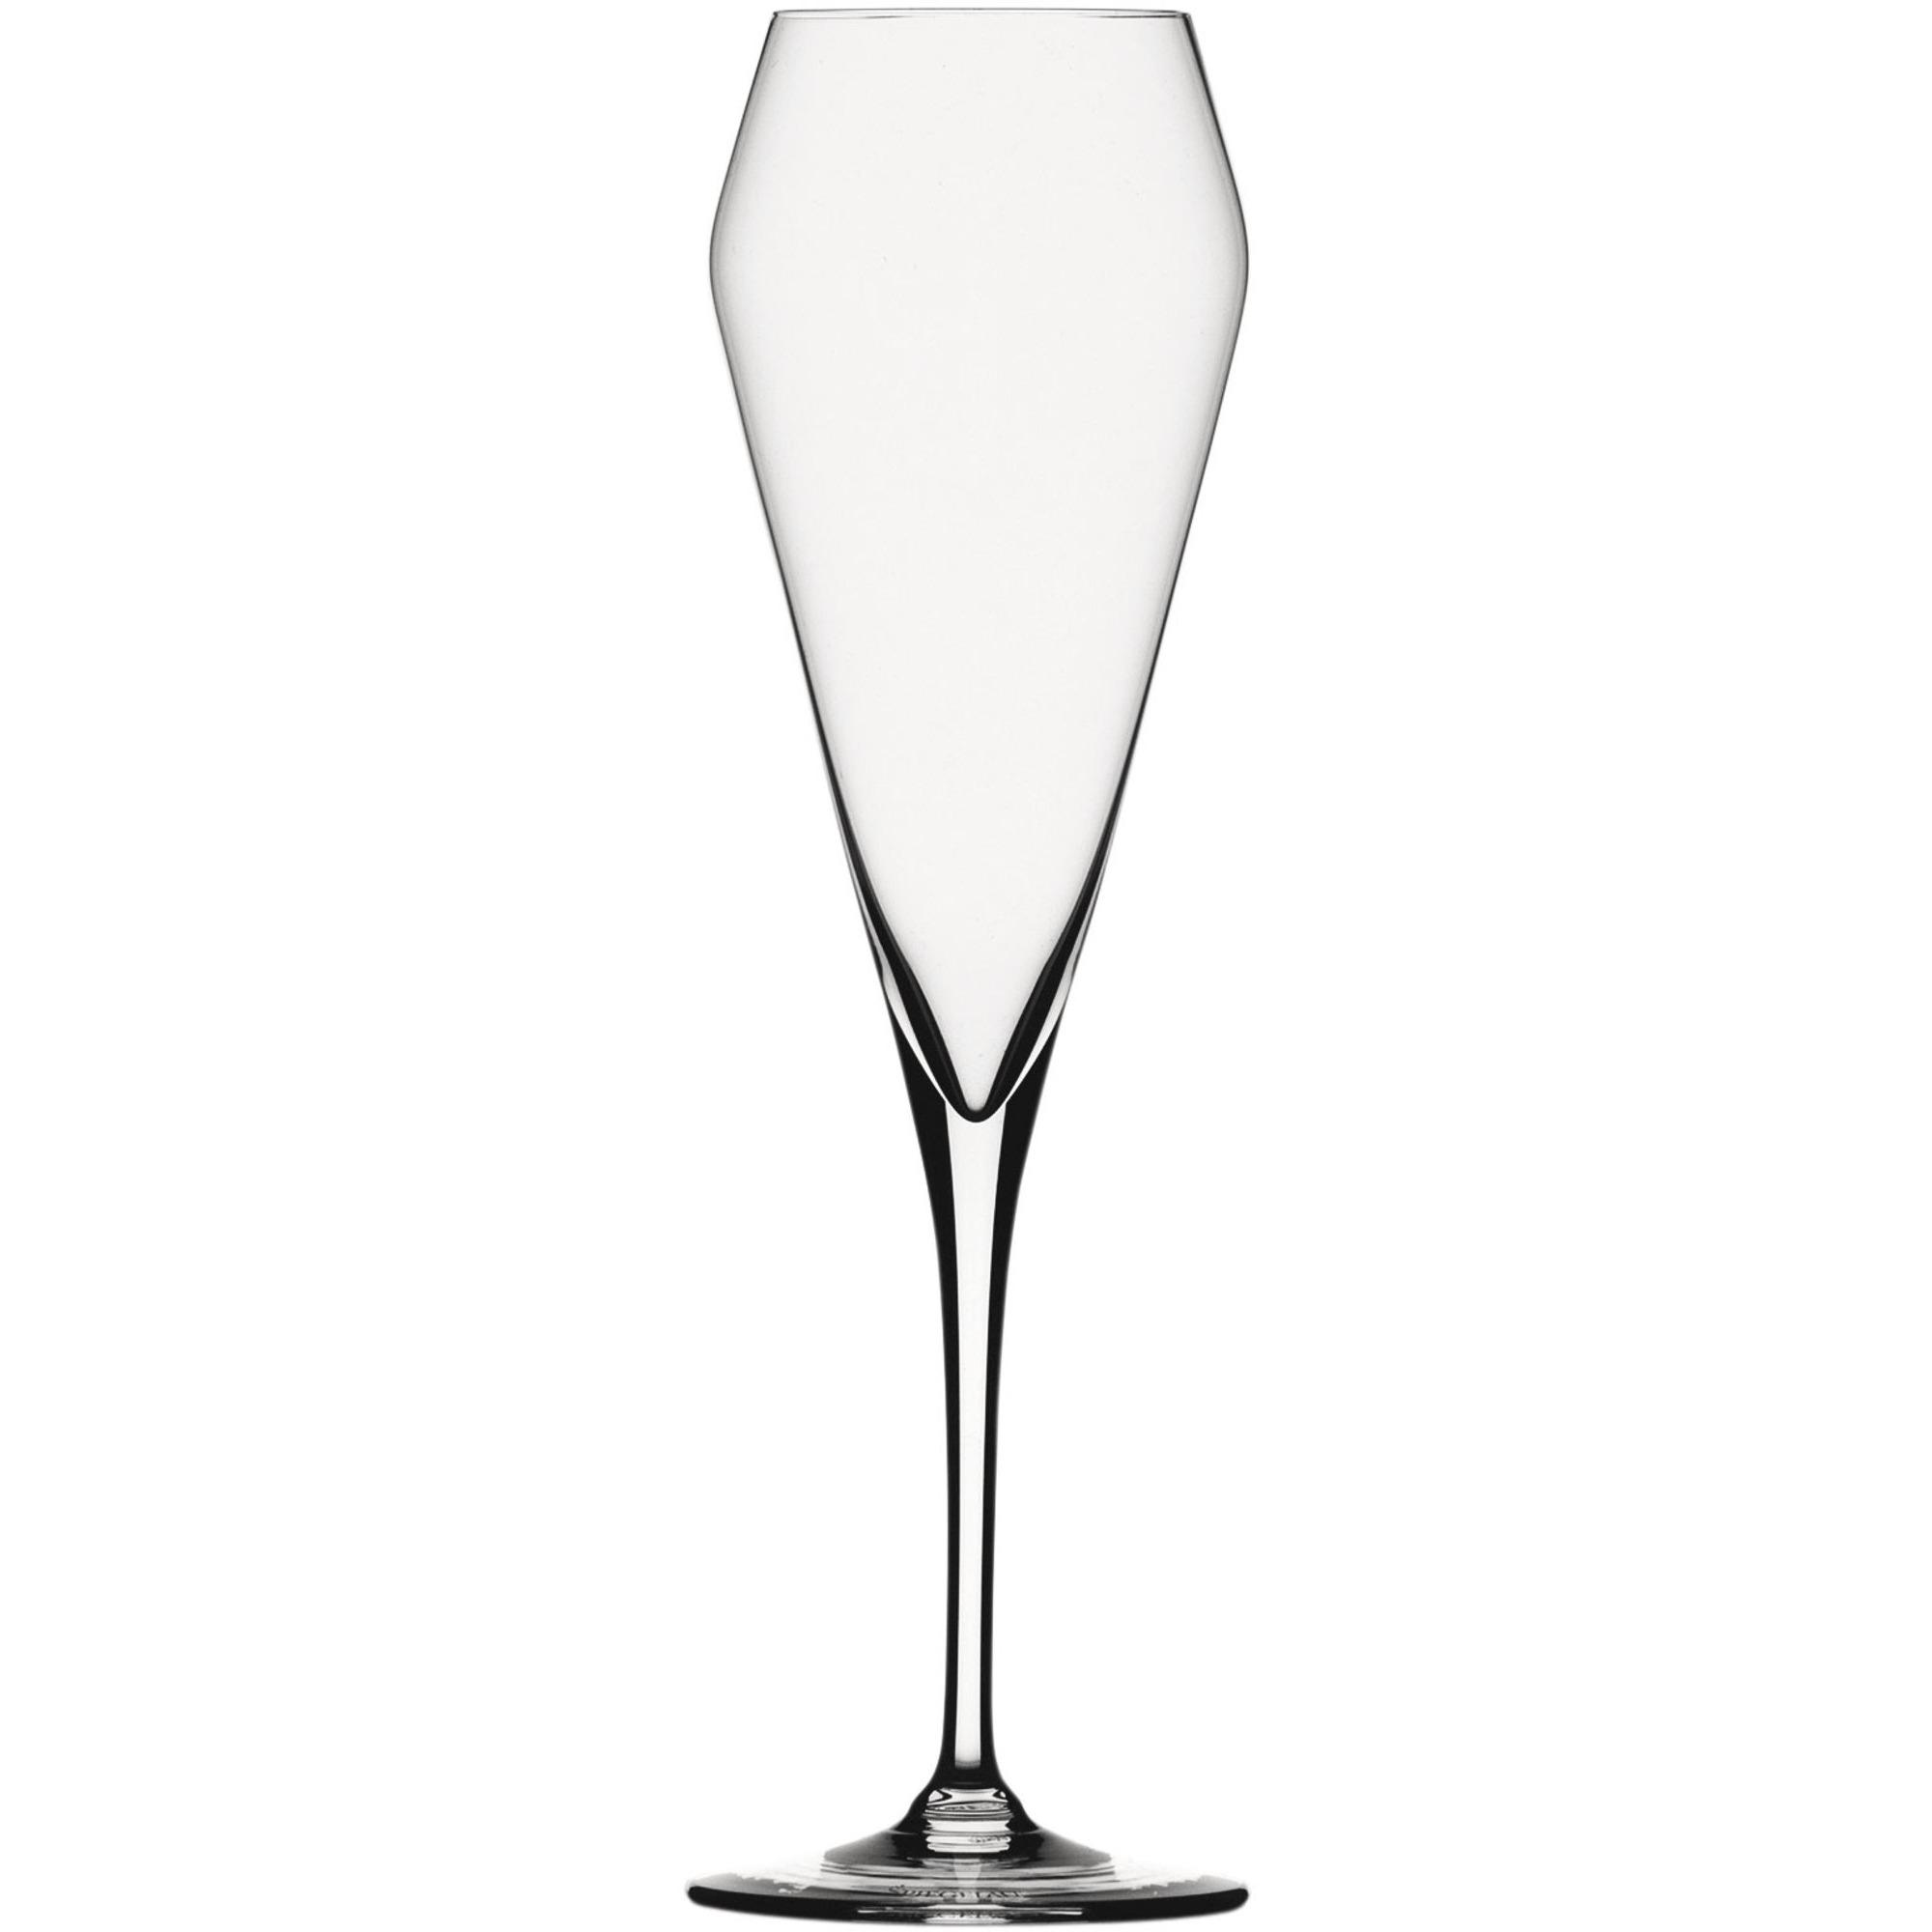 Spiegelau Willsberger Champagneglas 24cl 4pack